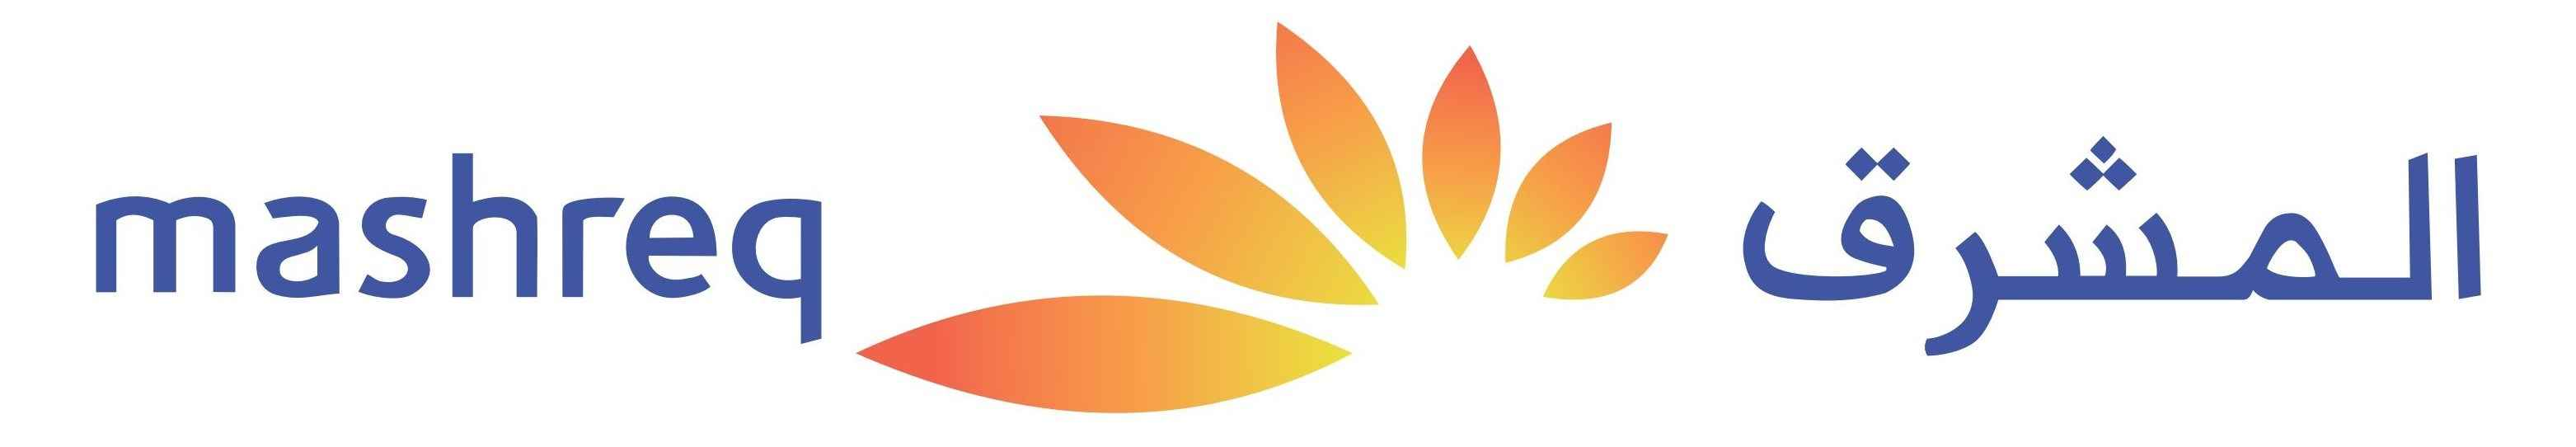 Mashreq bank Logo [EPS File] png